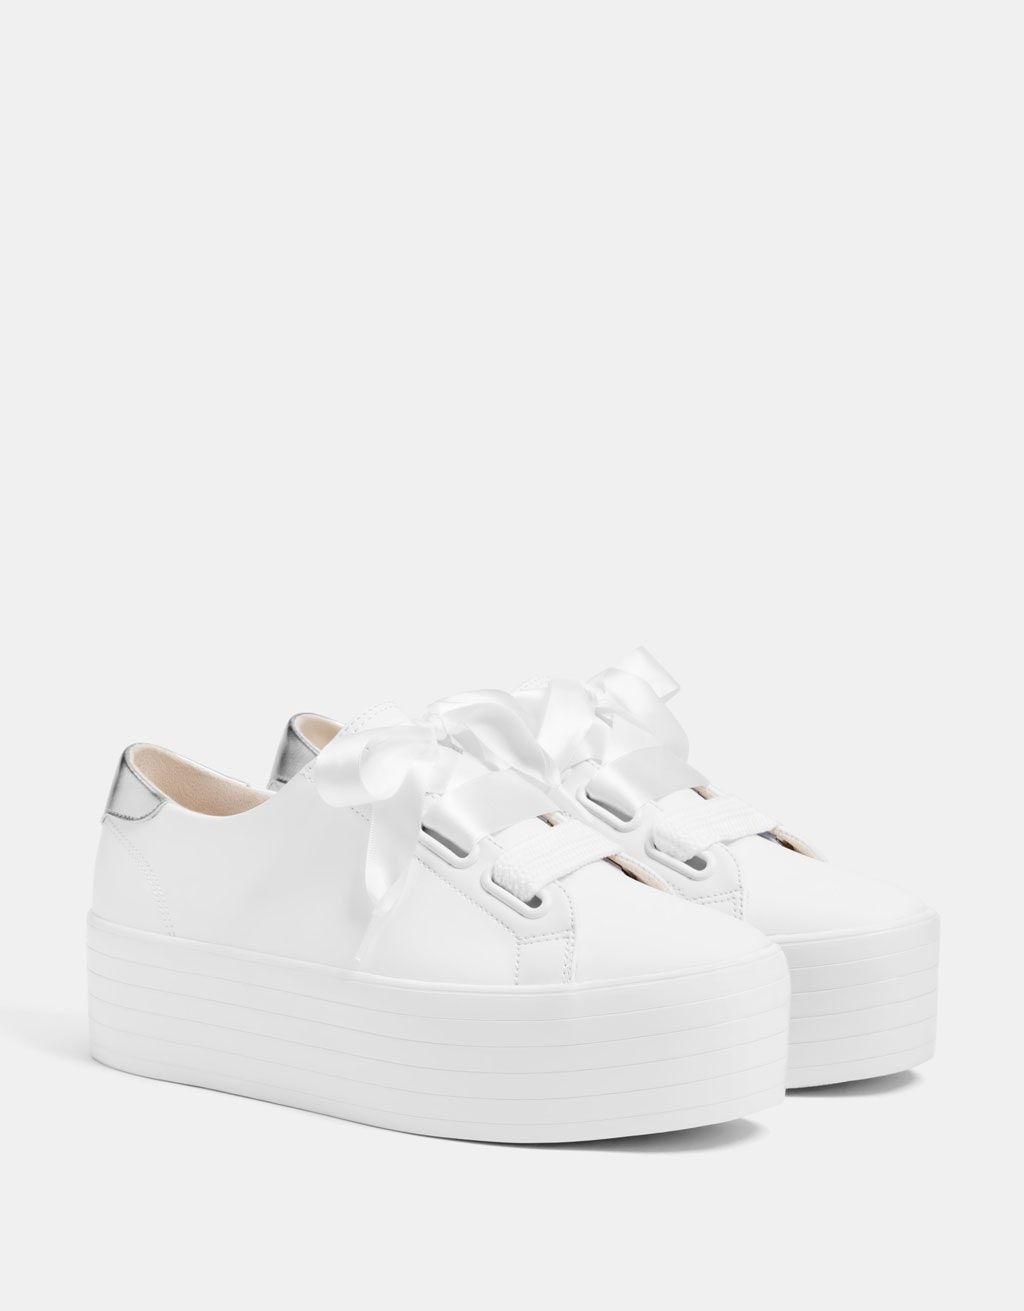 Bershka Platform Sneakers With Xl Laces Sepatu Kets Putih Sepatu Remaja Sepatu Kets